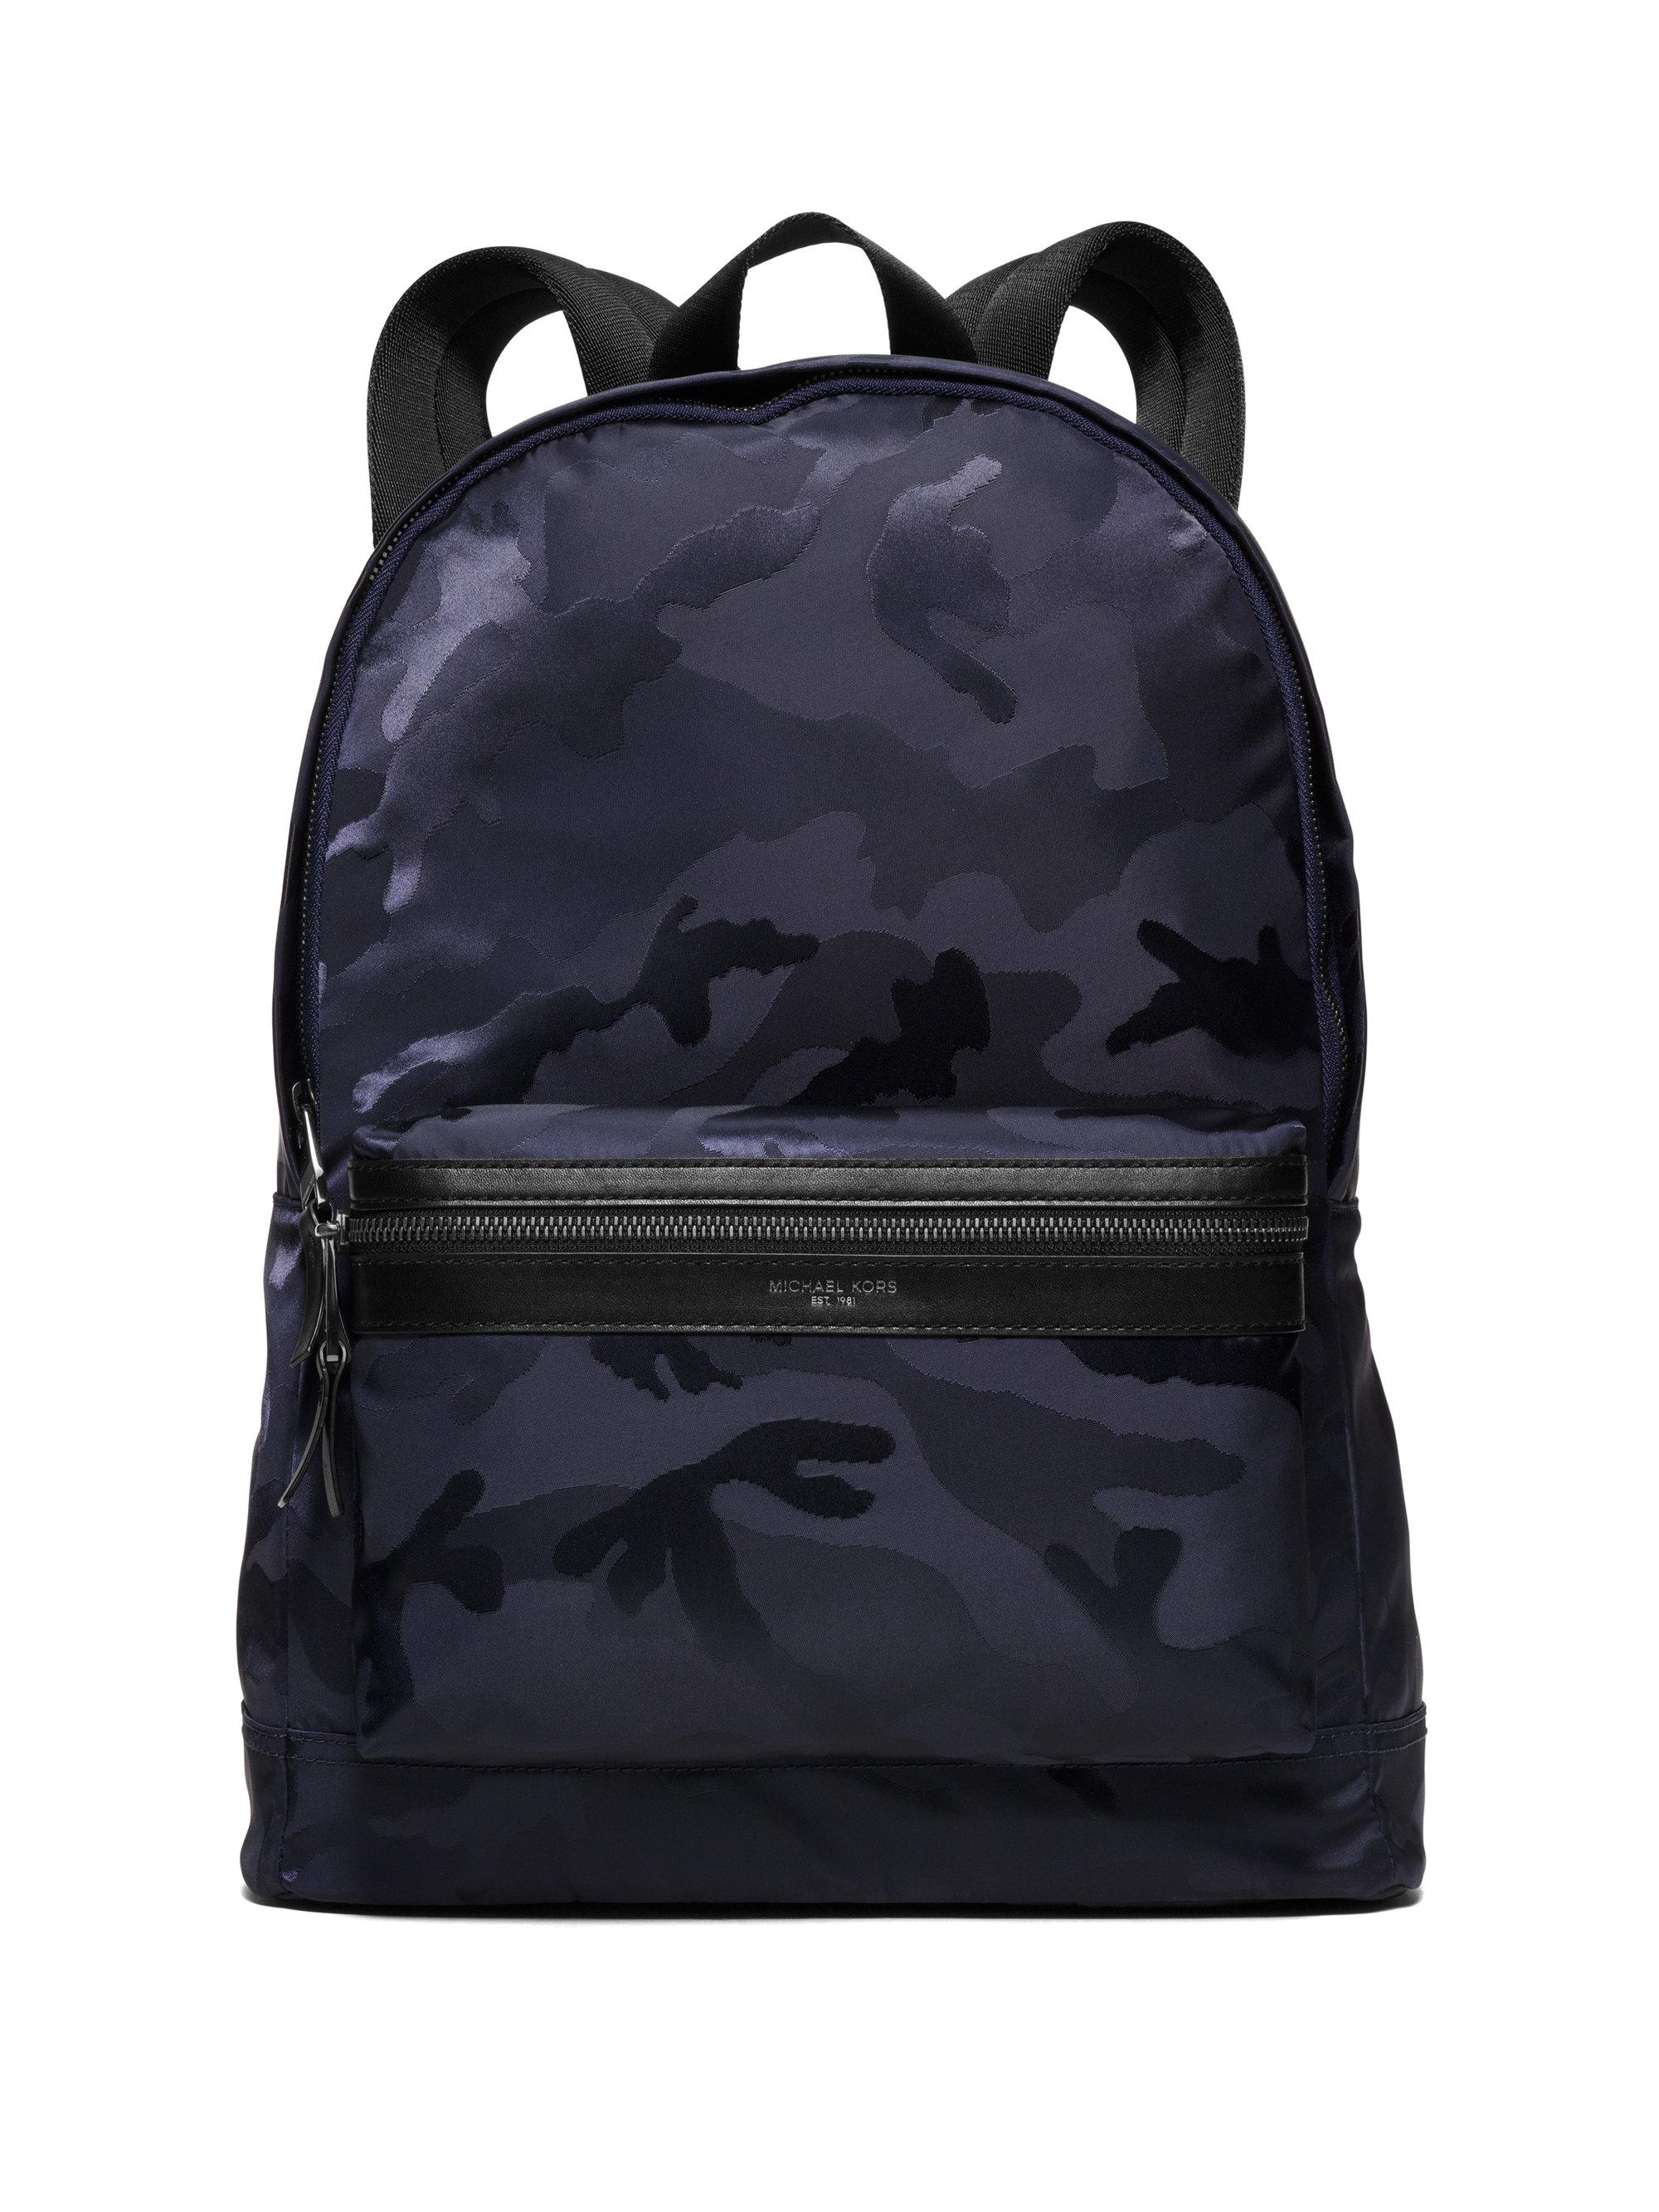 michael kors kent camouflage nylon jacquard backpack in black lyst. Black Bedroom Furniture Sets. Home Design Ideas